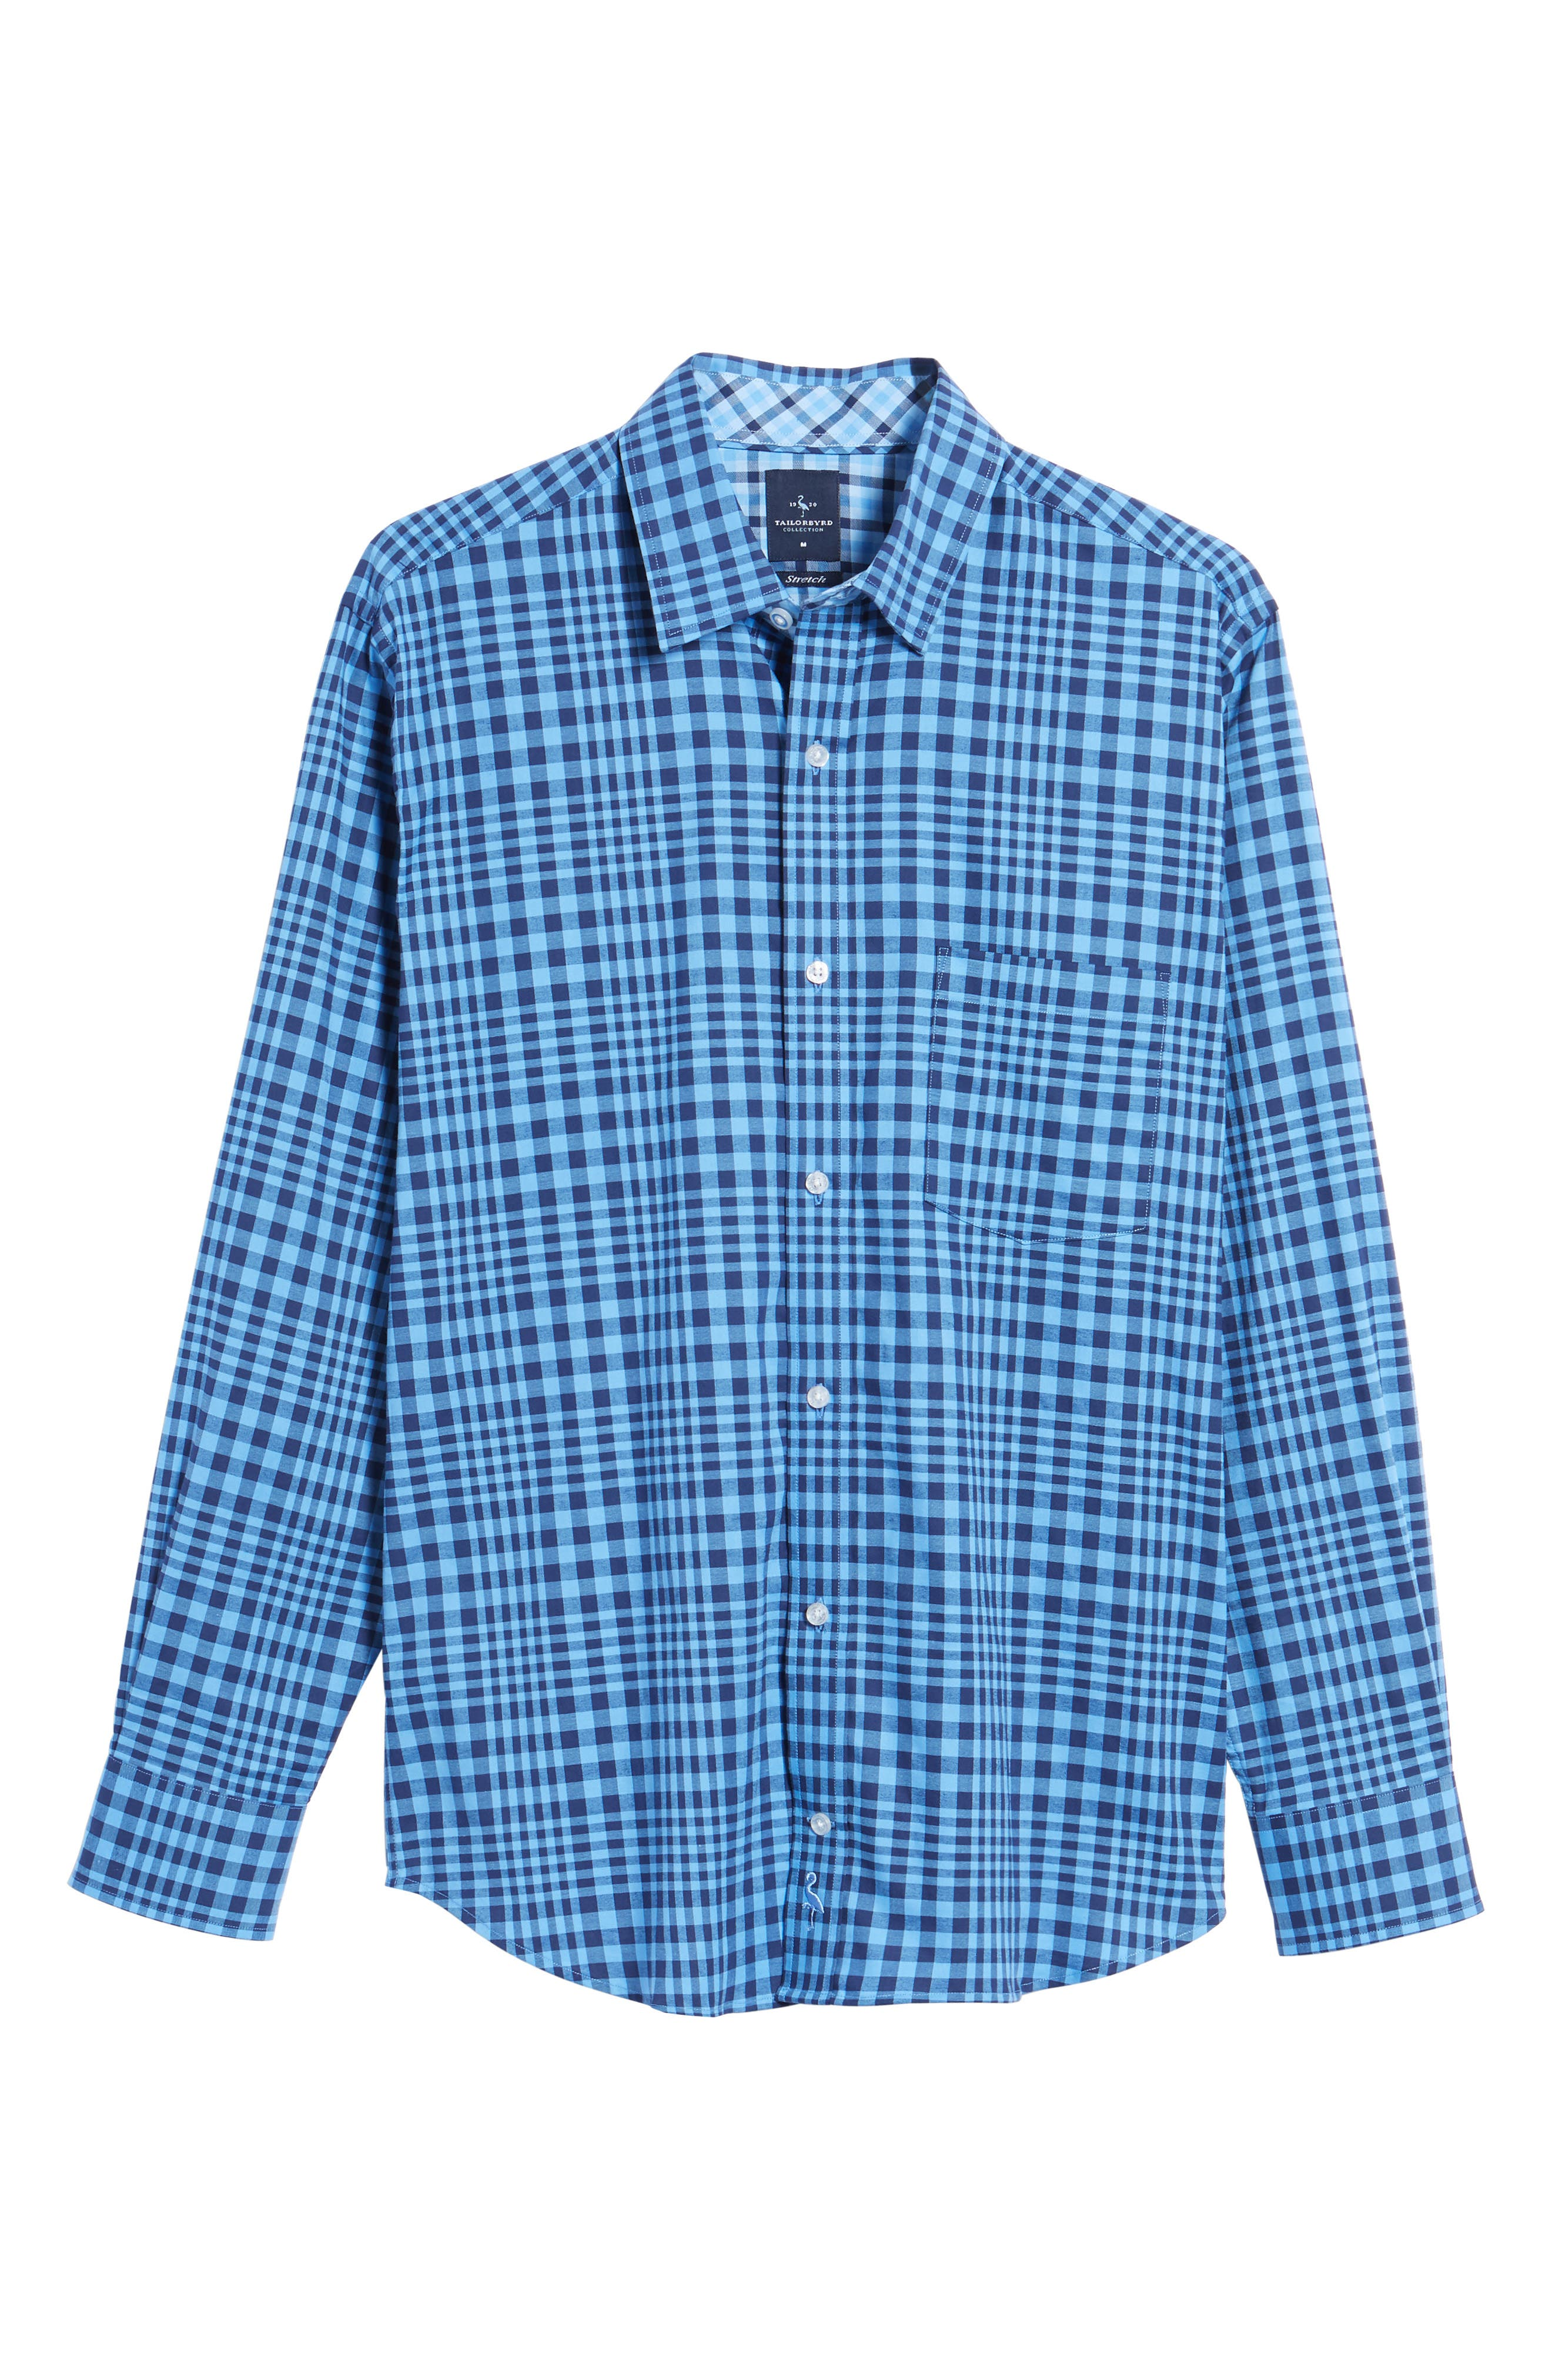 Bayou Cone Check Sport Shirt,                             Alternate thumbnail 6, color,                             410